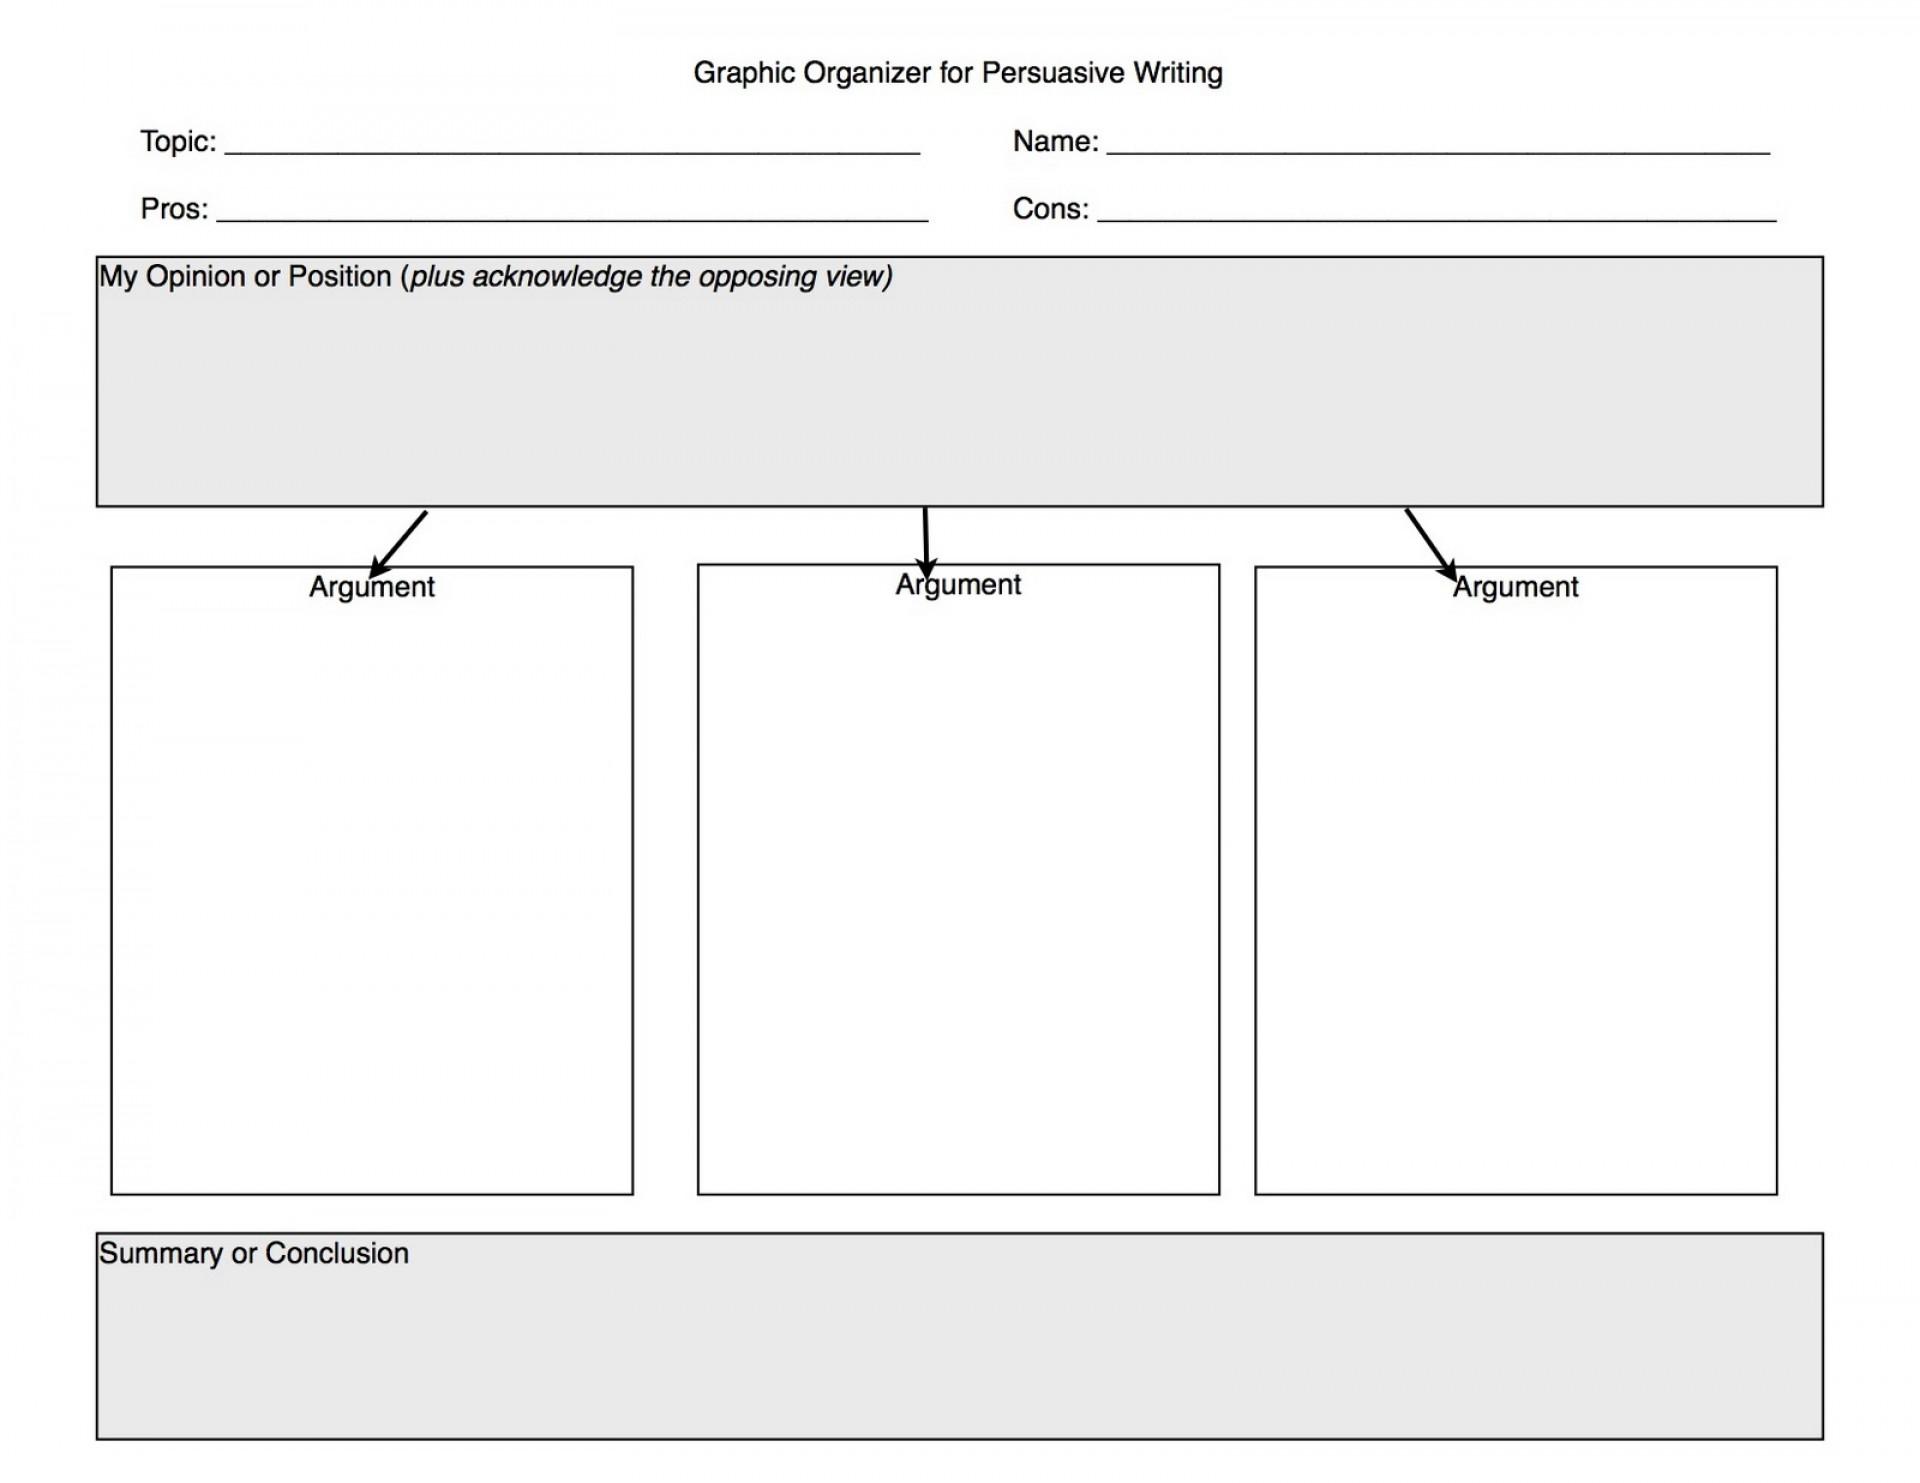 019 Essay Example Persuasive Writing Graphic Organizer Argumentative Impressive Pdf Middle School 1920